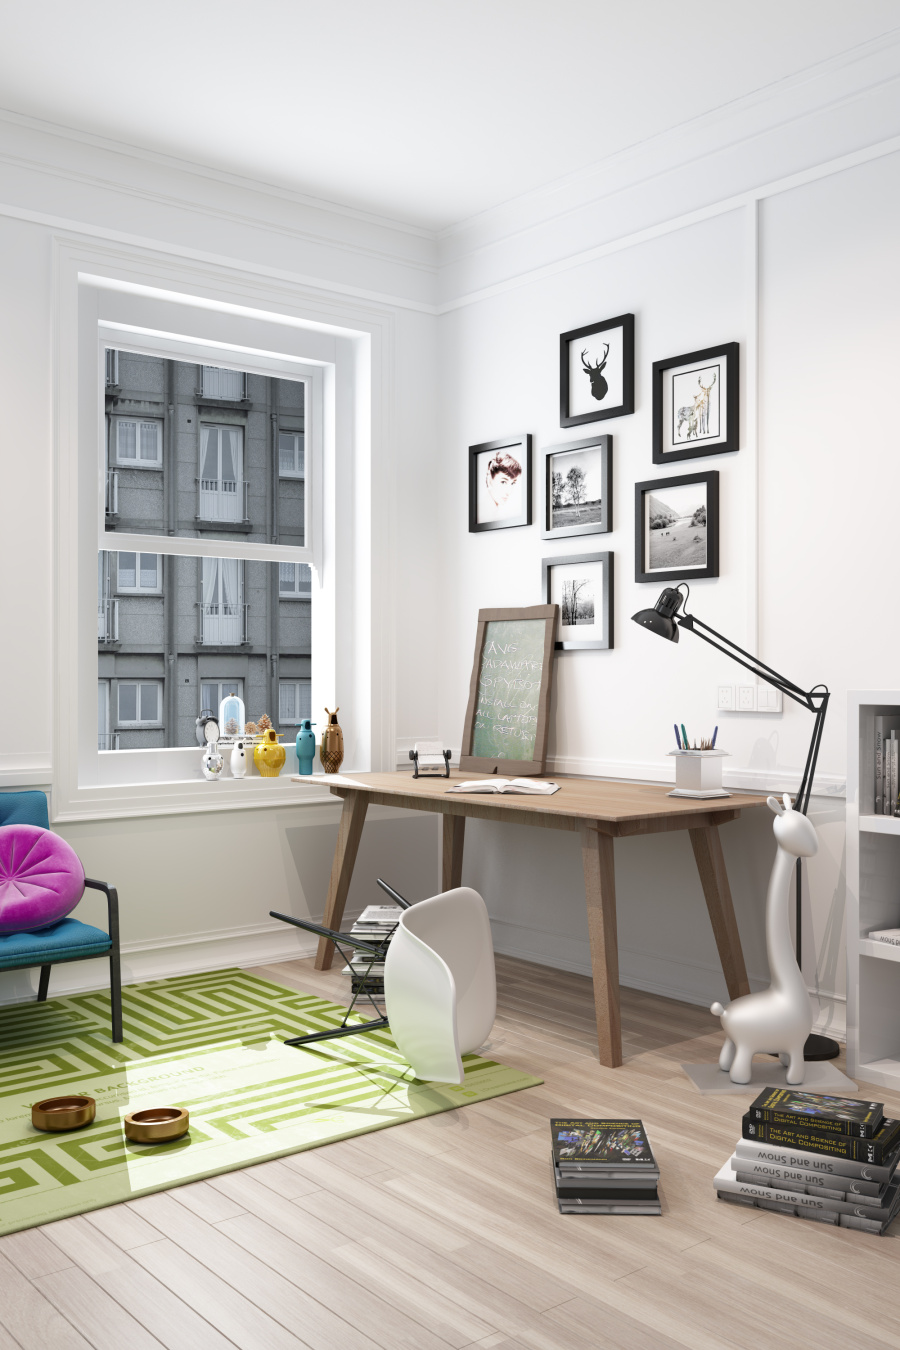 3dmax案例+空间灯光可以|室内设计|材质/讲解在哪建筑招到室内设计师?图片